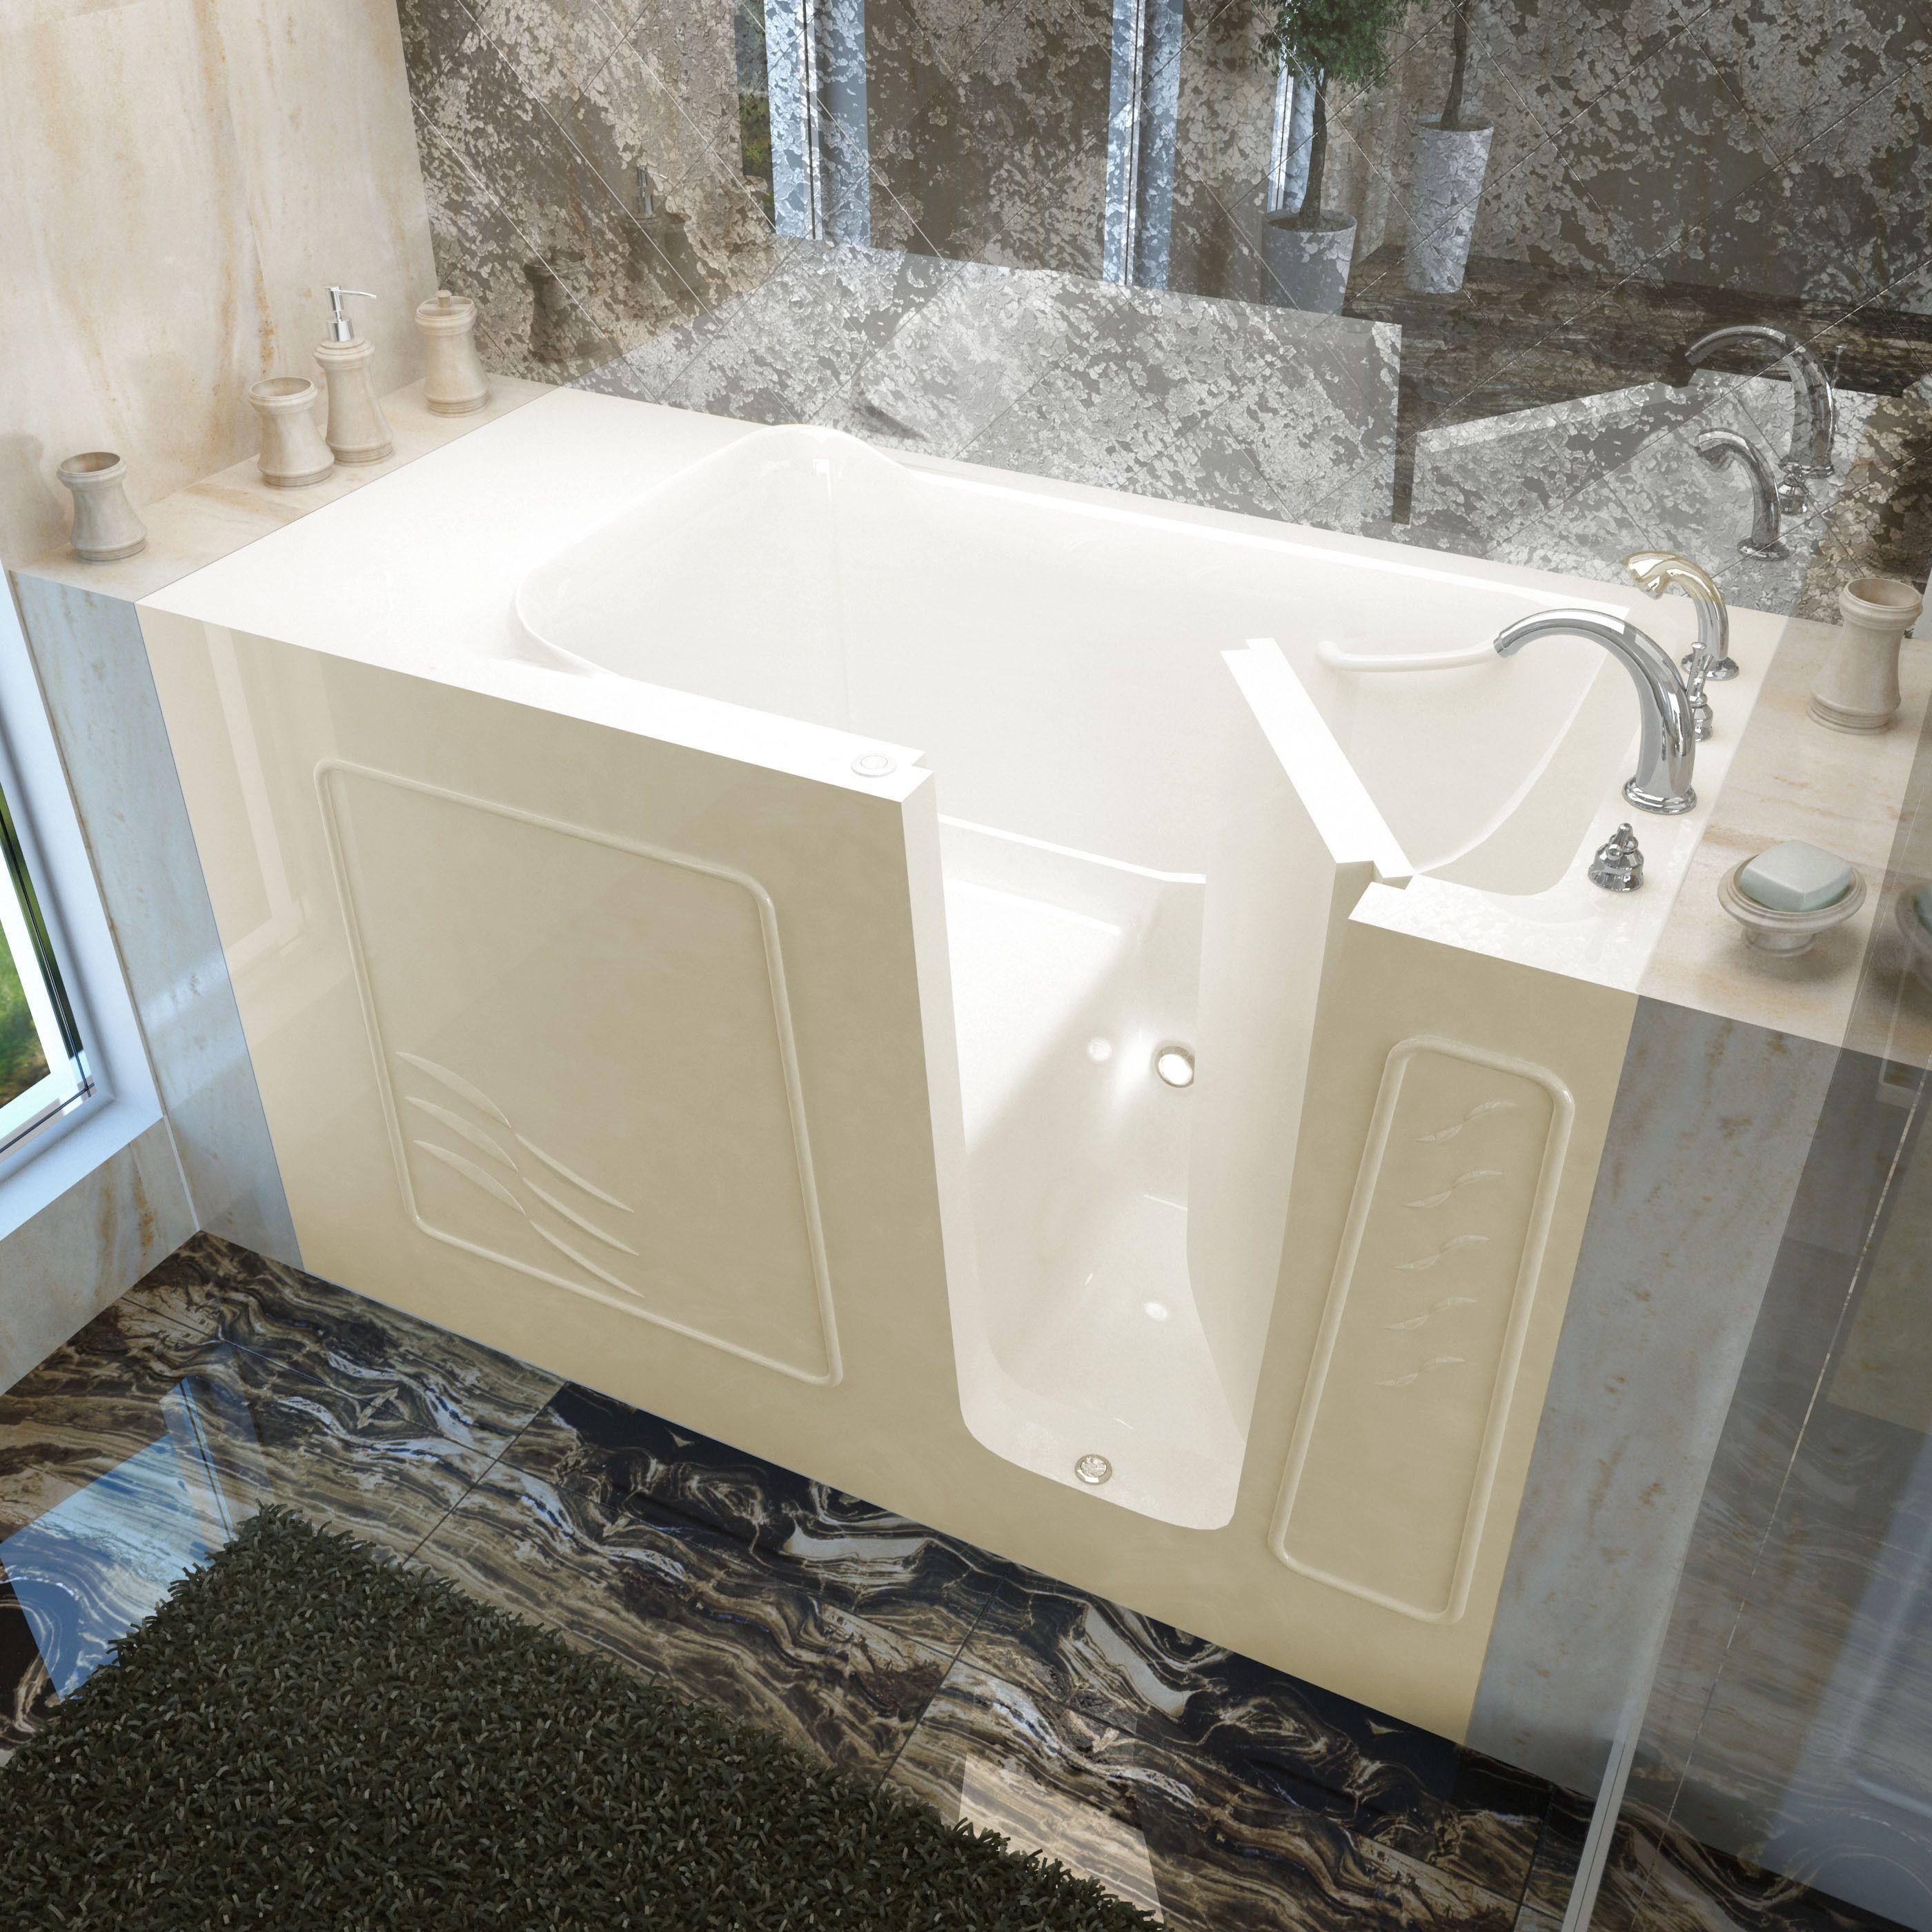 MediTub 30x60-inch Right Drain Biscuit Soaking Walk-In Bathtub ...